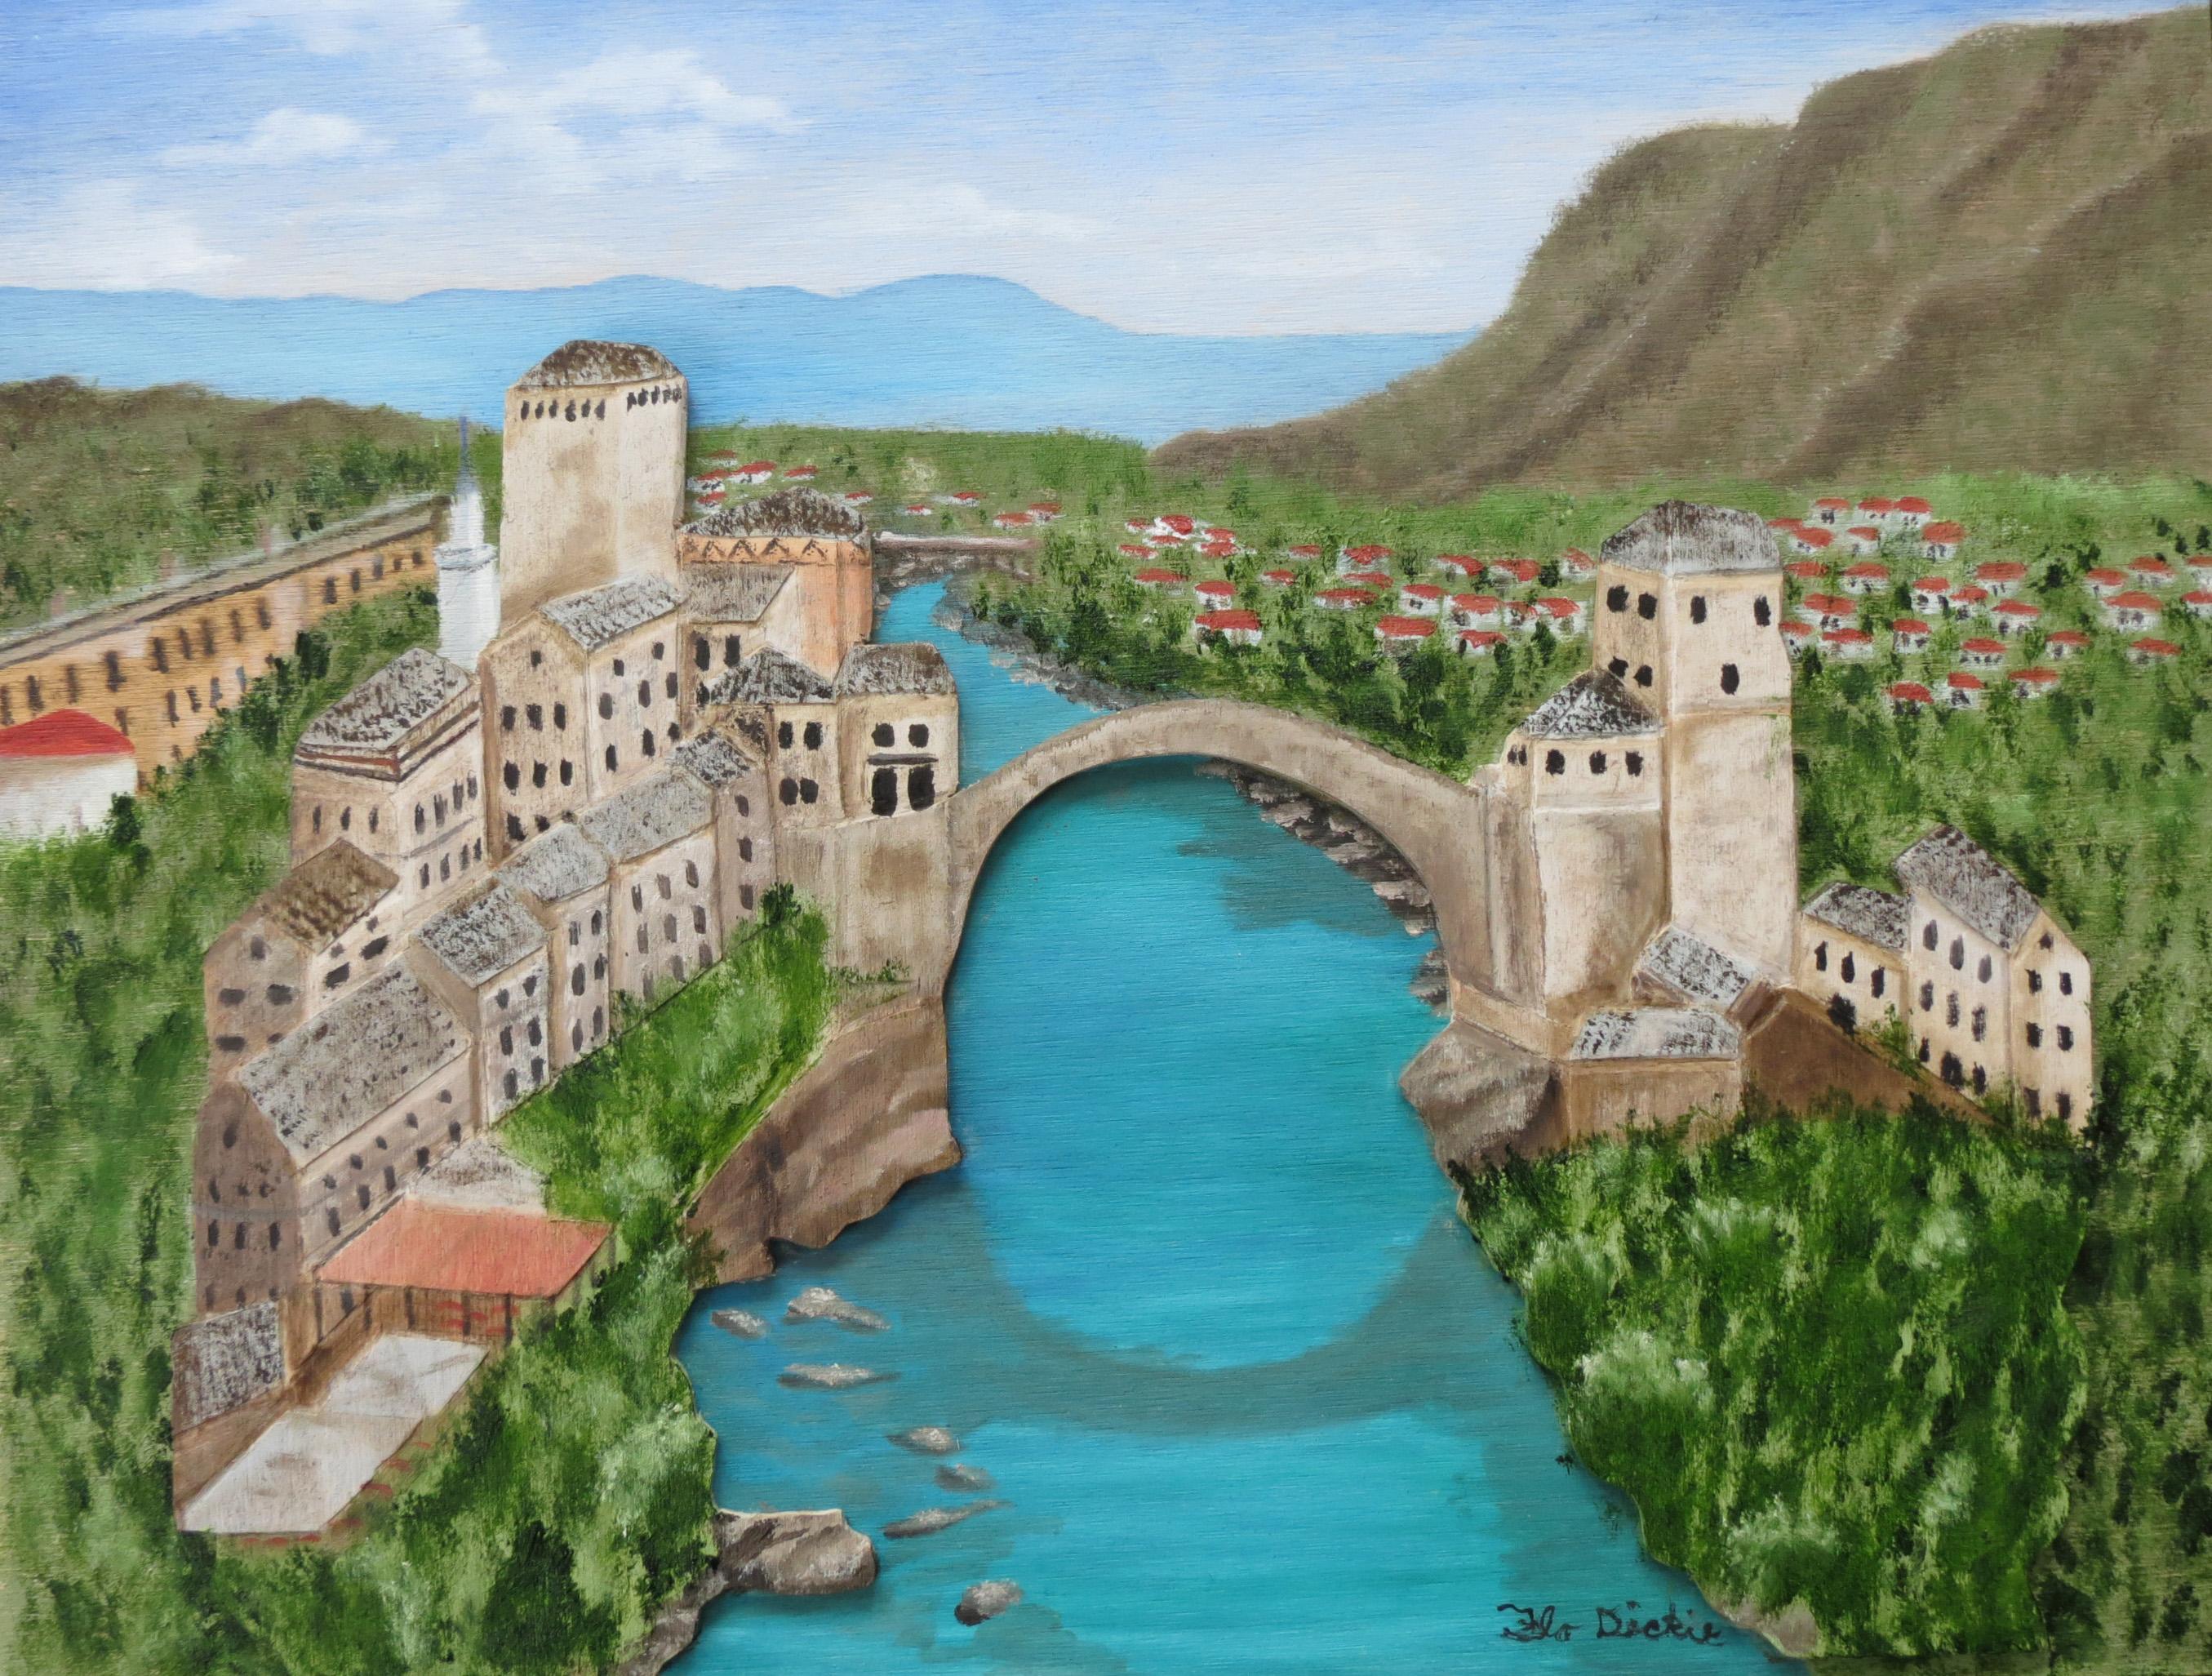 Mostar-Neretva-River - Flo Dickie